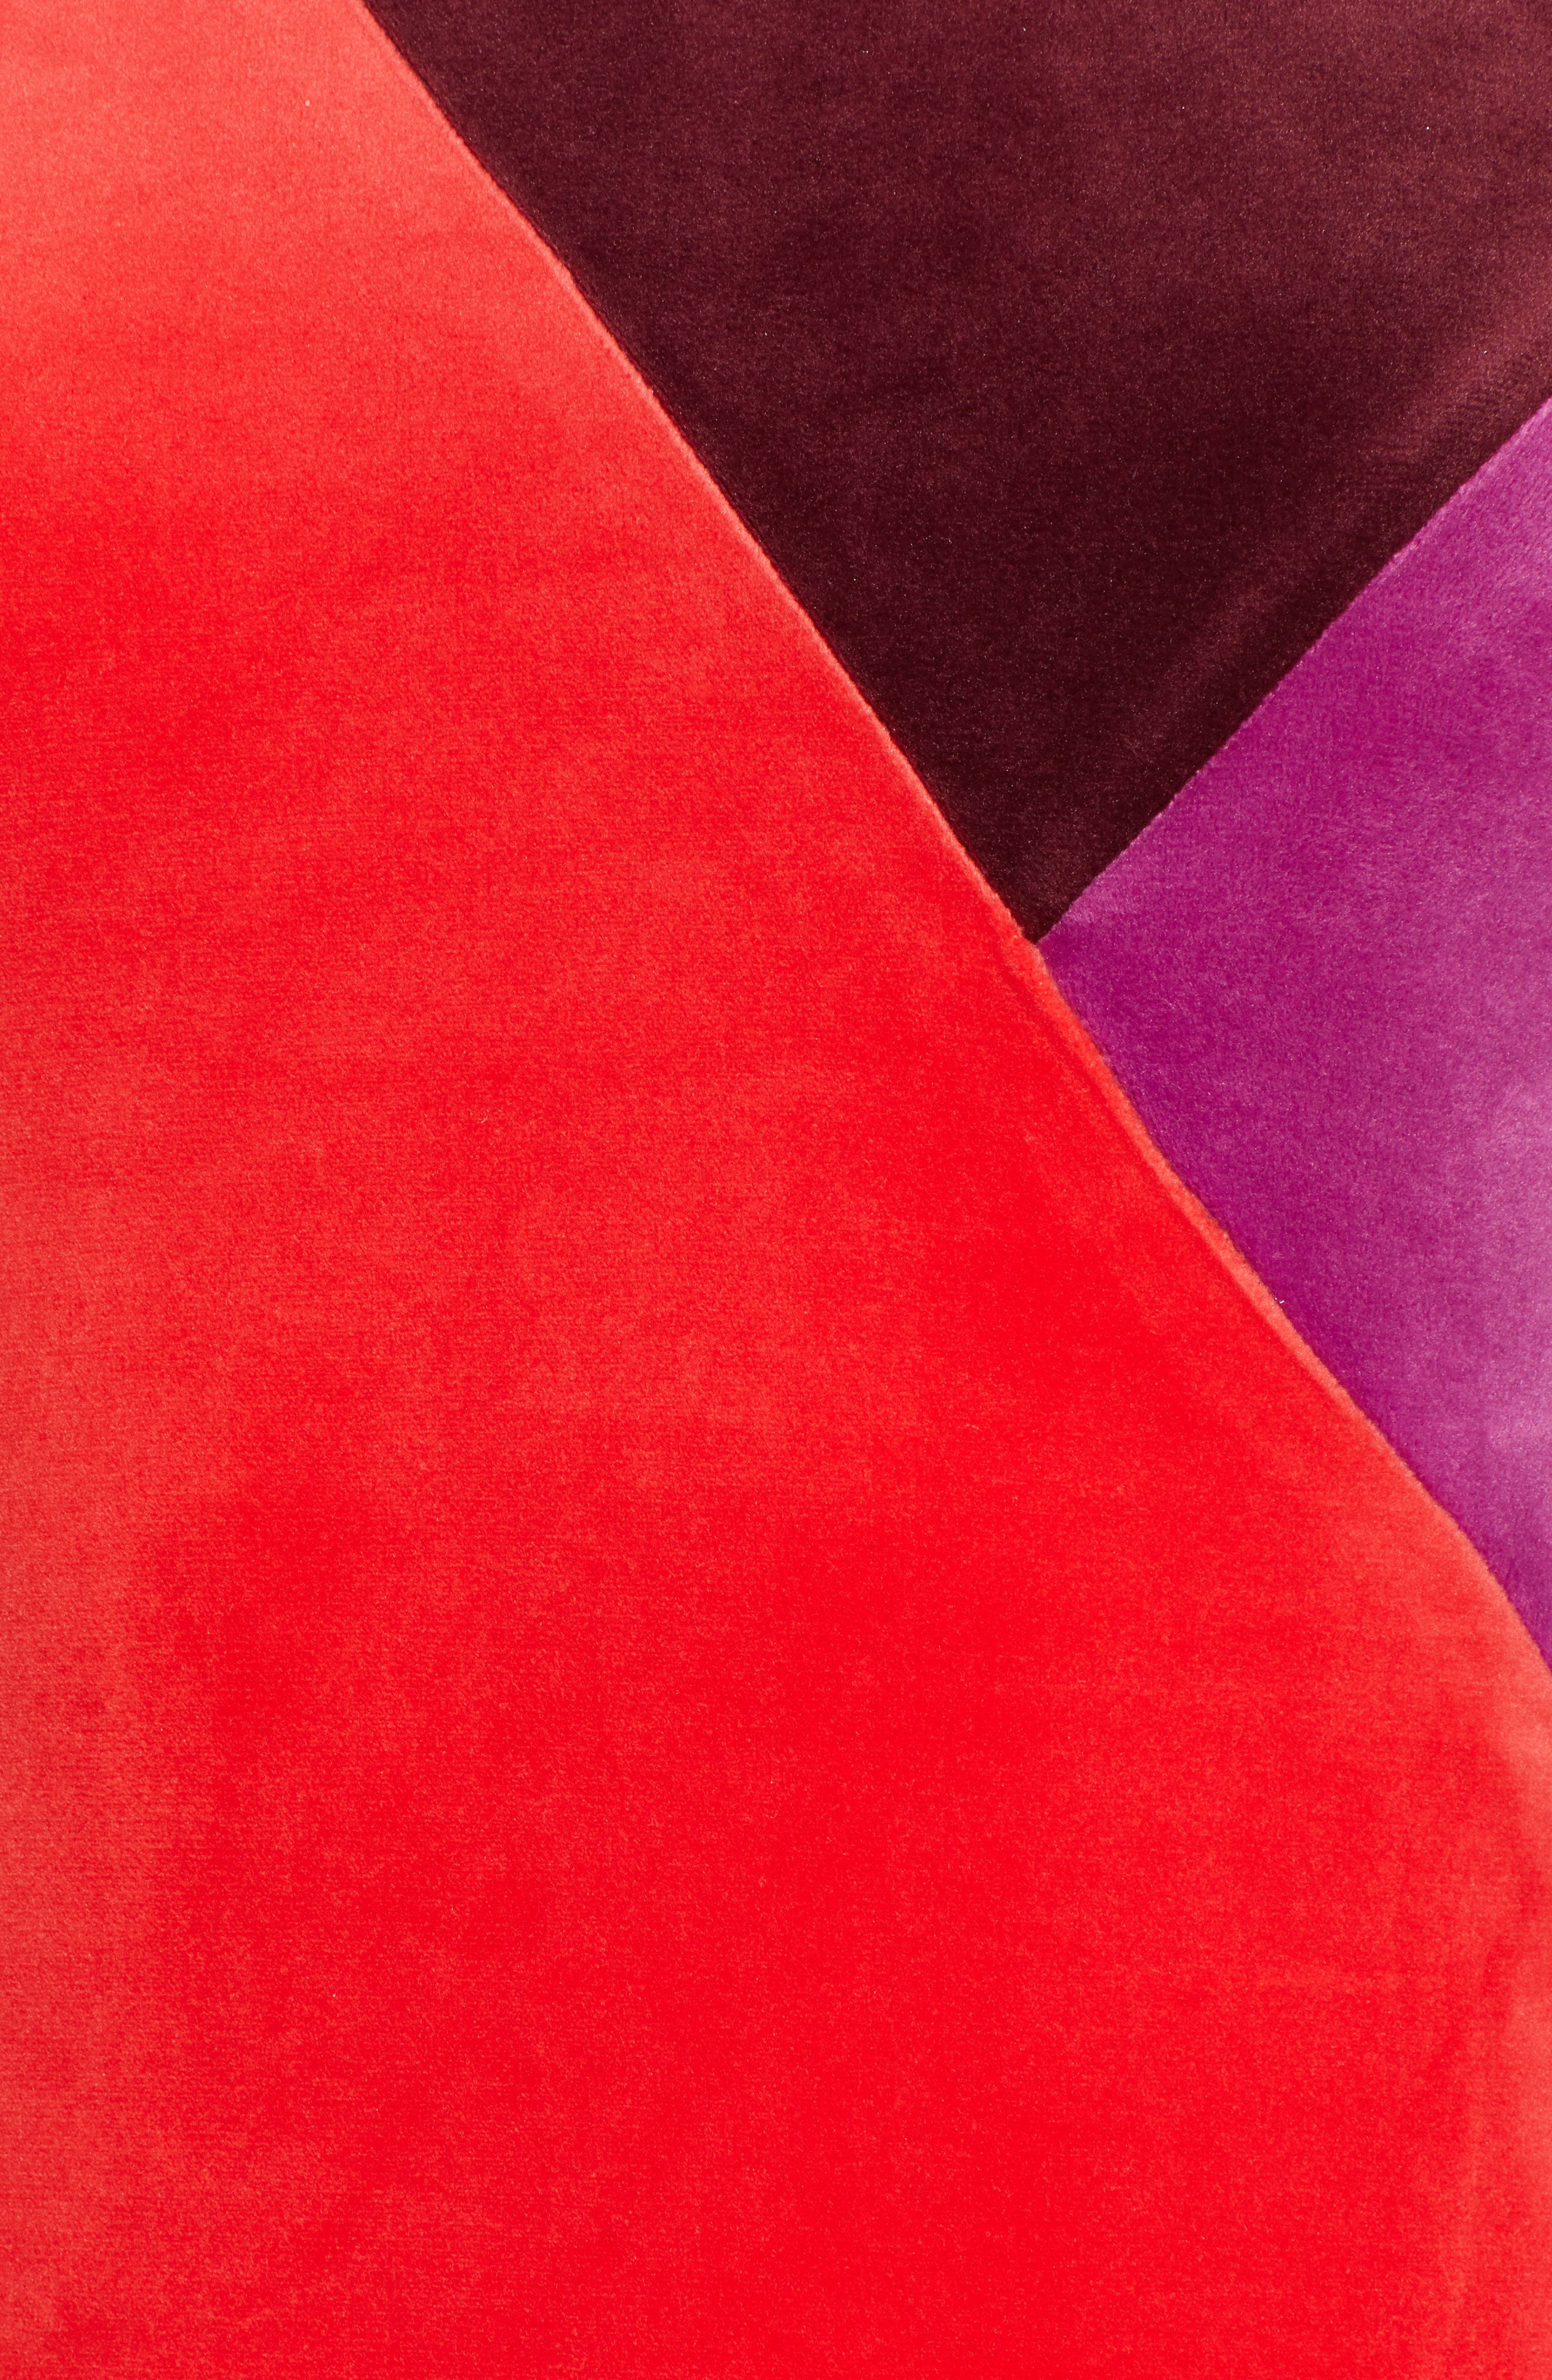 Velluto Velour Midi Dress,                             Alternate thumbnail 6, color,                             BORGOGNA